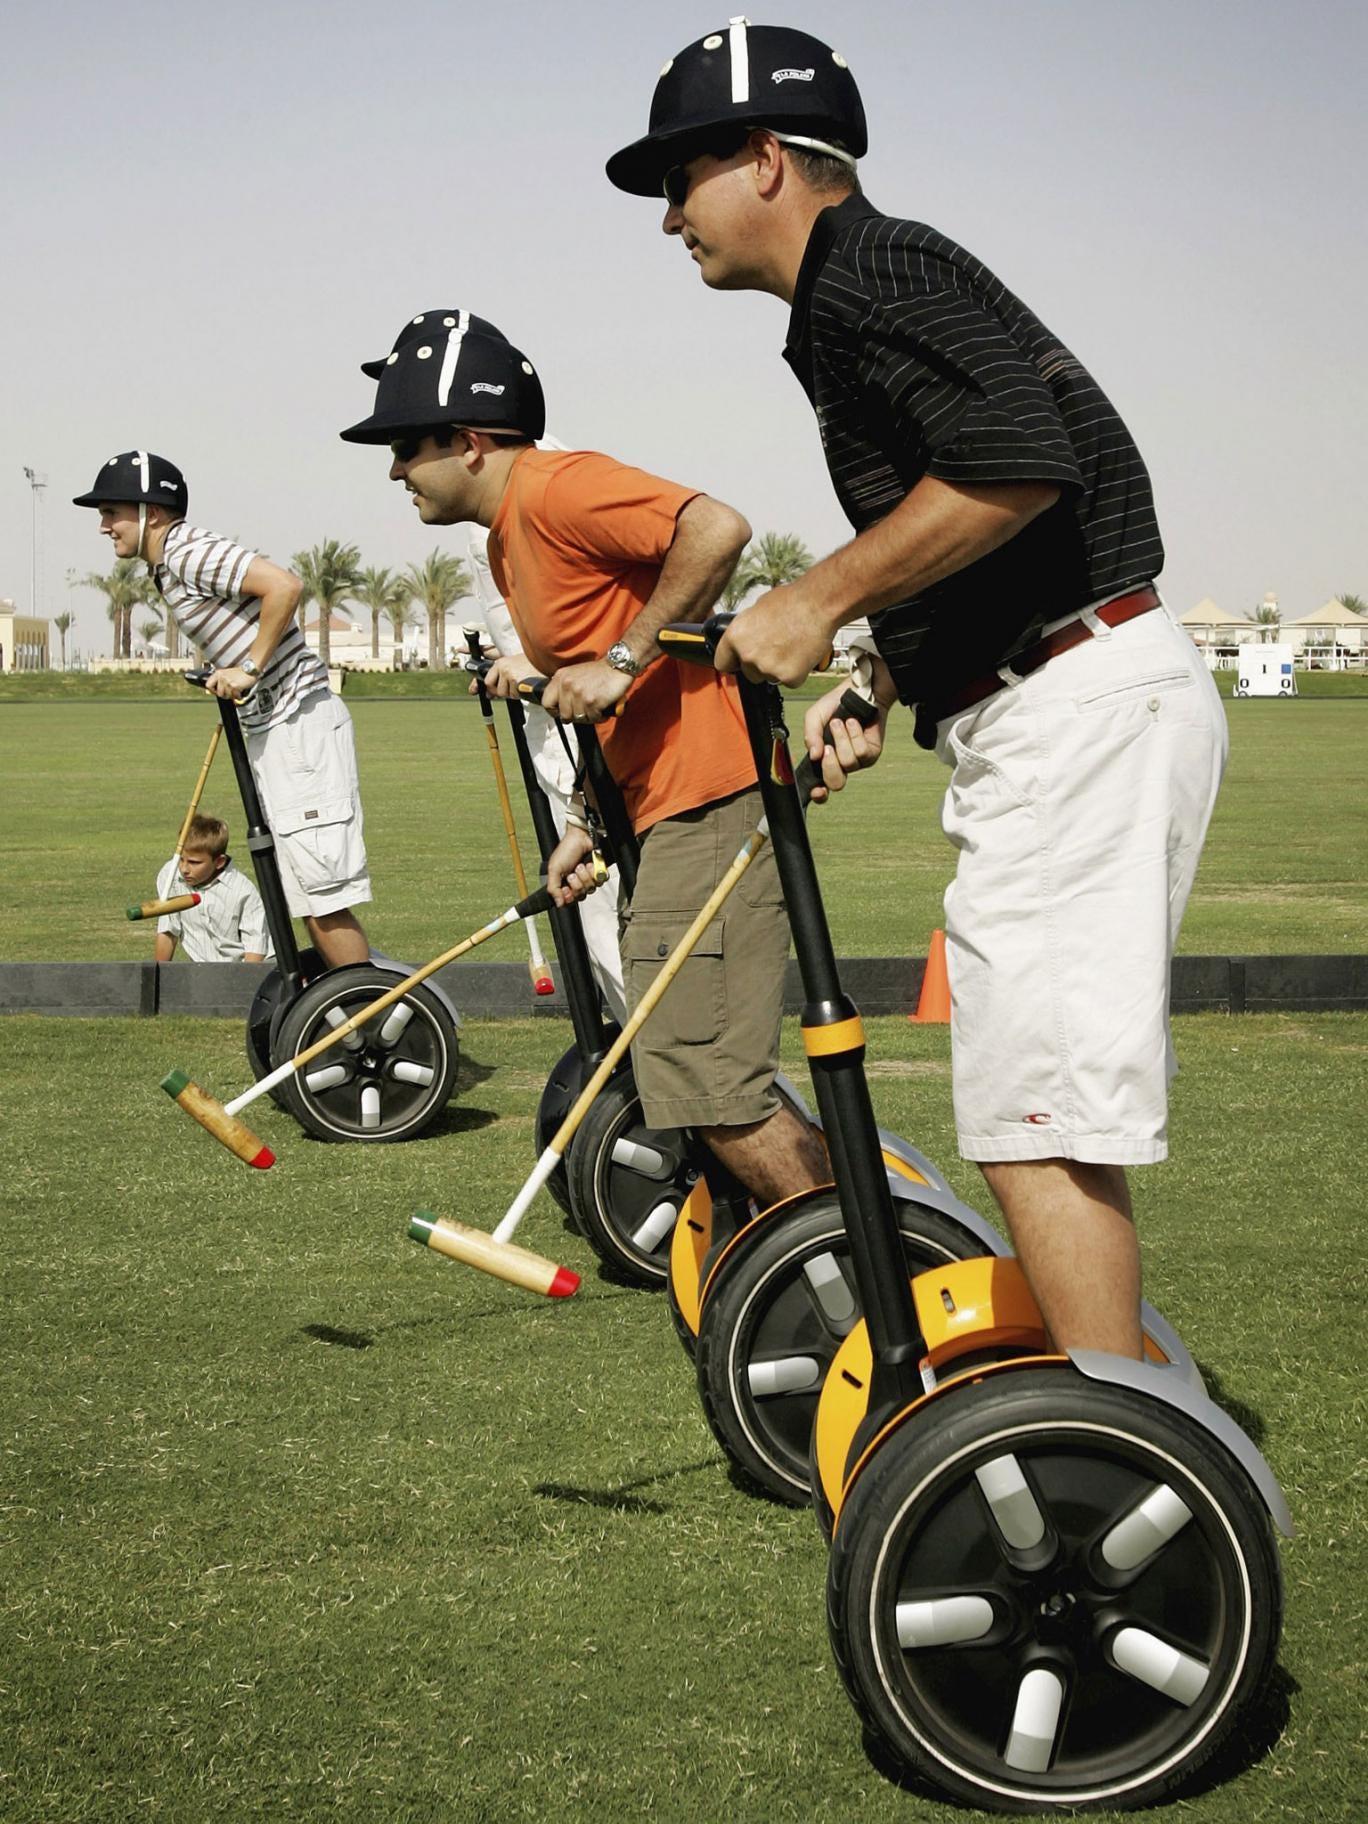 Expatriates play polo on Segway Human Transporters before a charity polo match at Dubai Polo Club